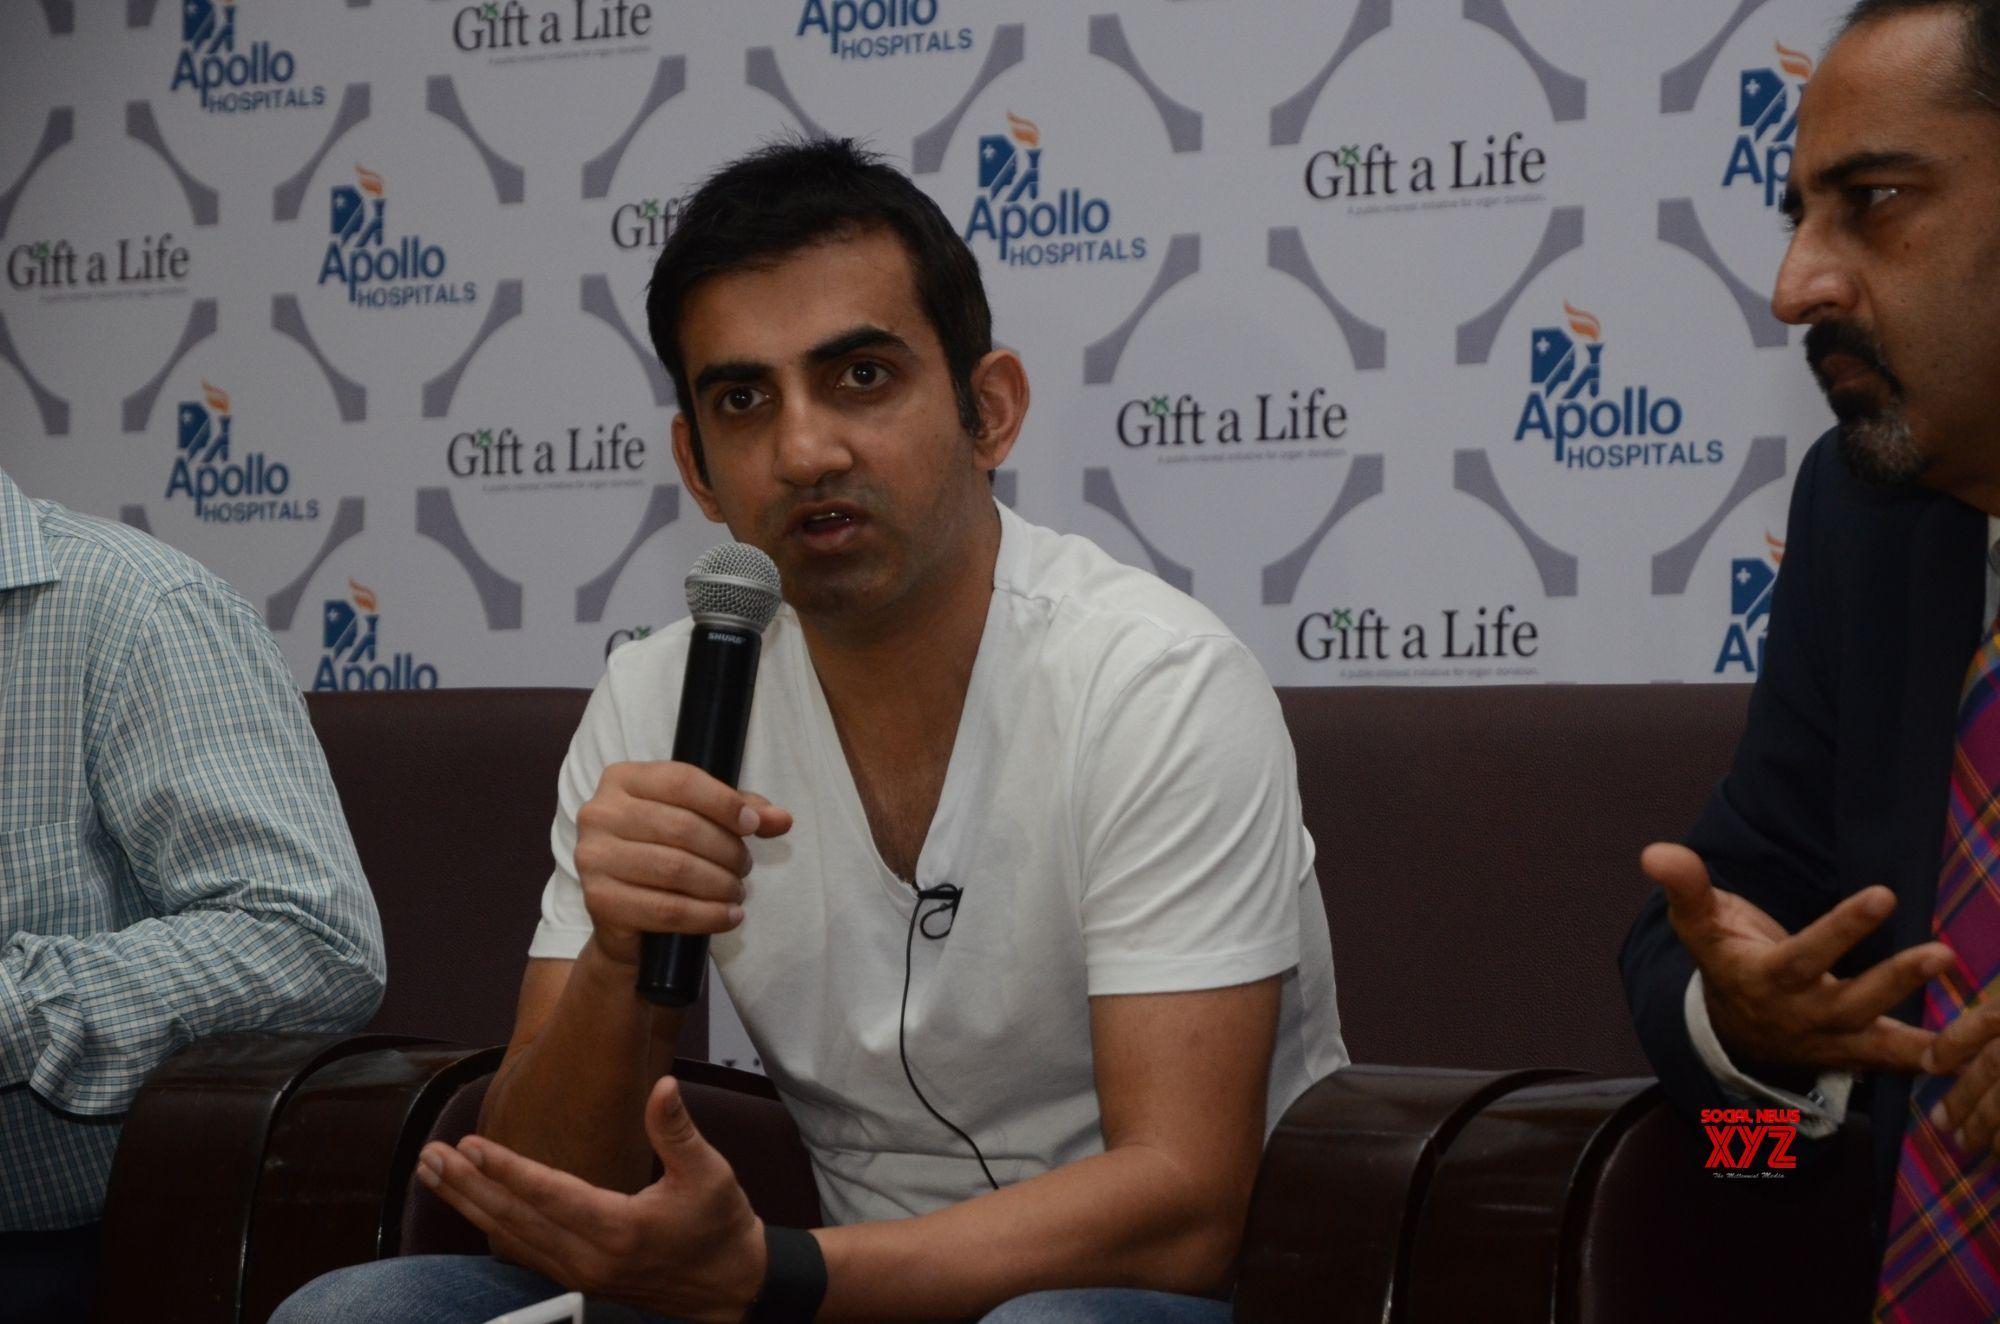 Gautam Gambhir joins organ donation awareness drive